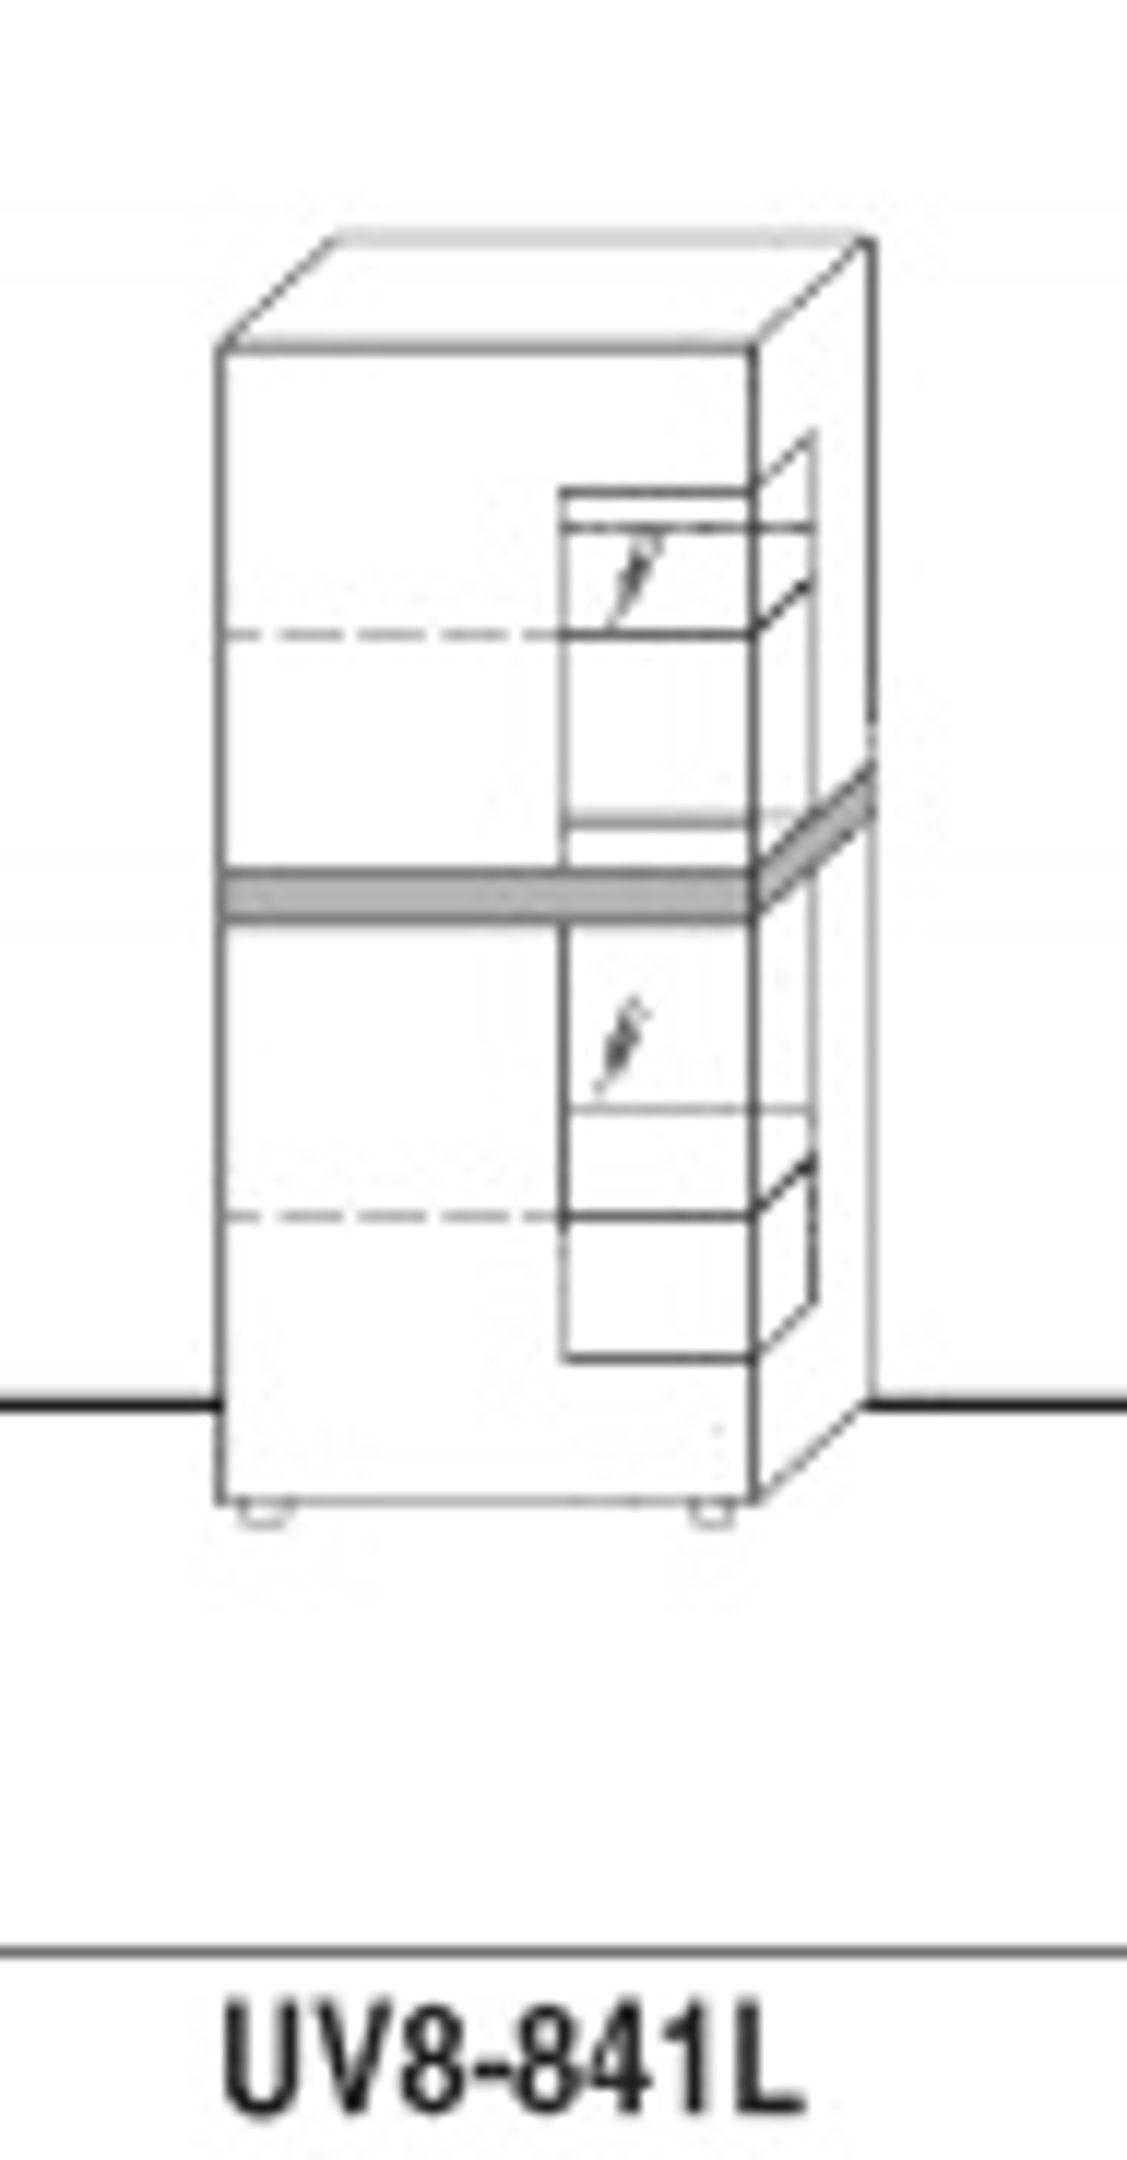 GWINNER Highboard-Elemente 8Raster, Casale UV8-841L, Lahr, Freiburg ...